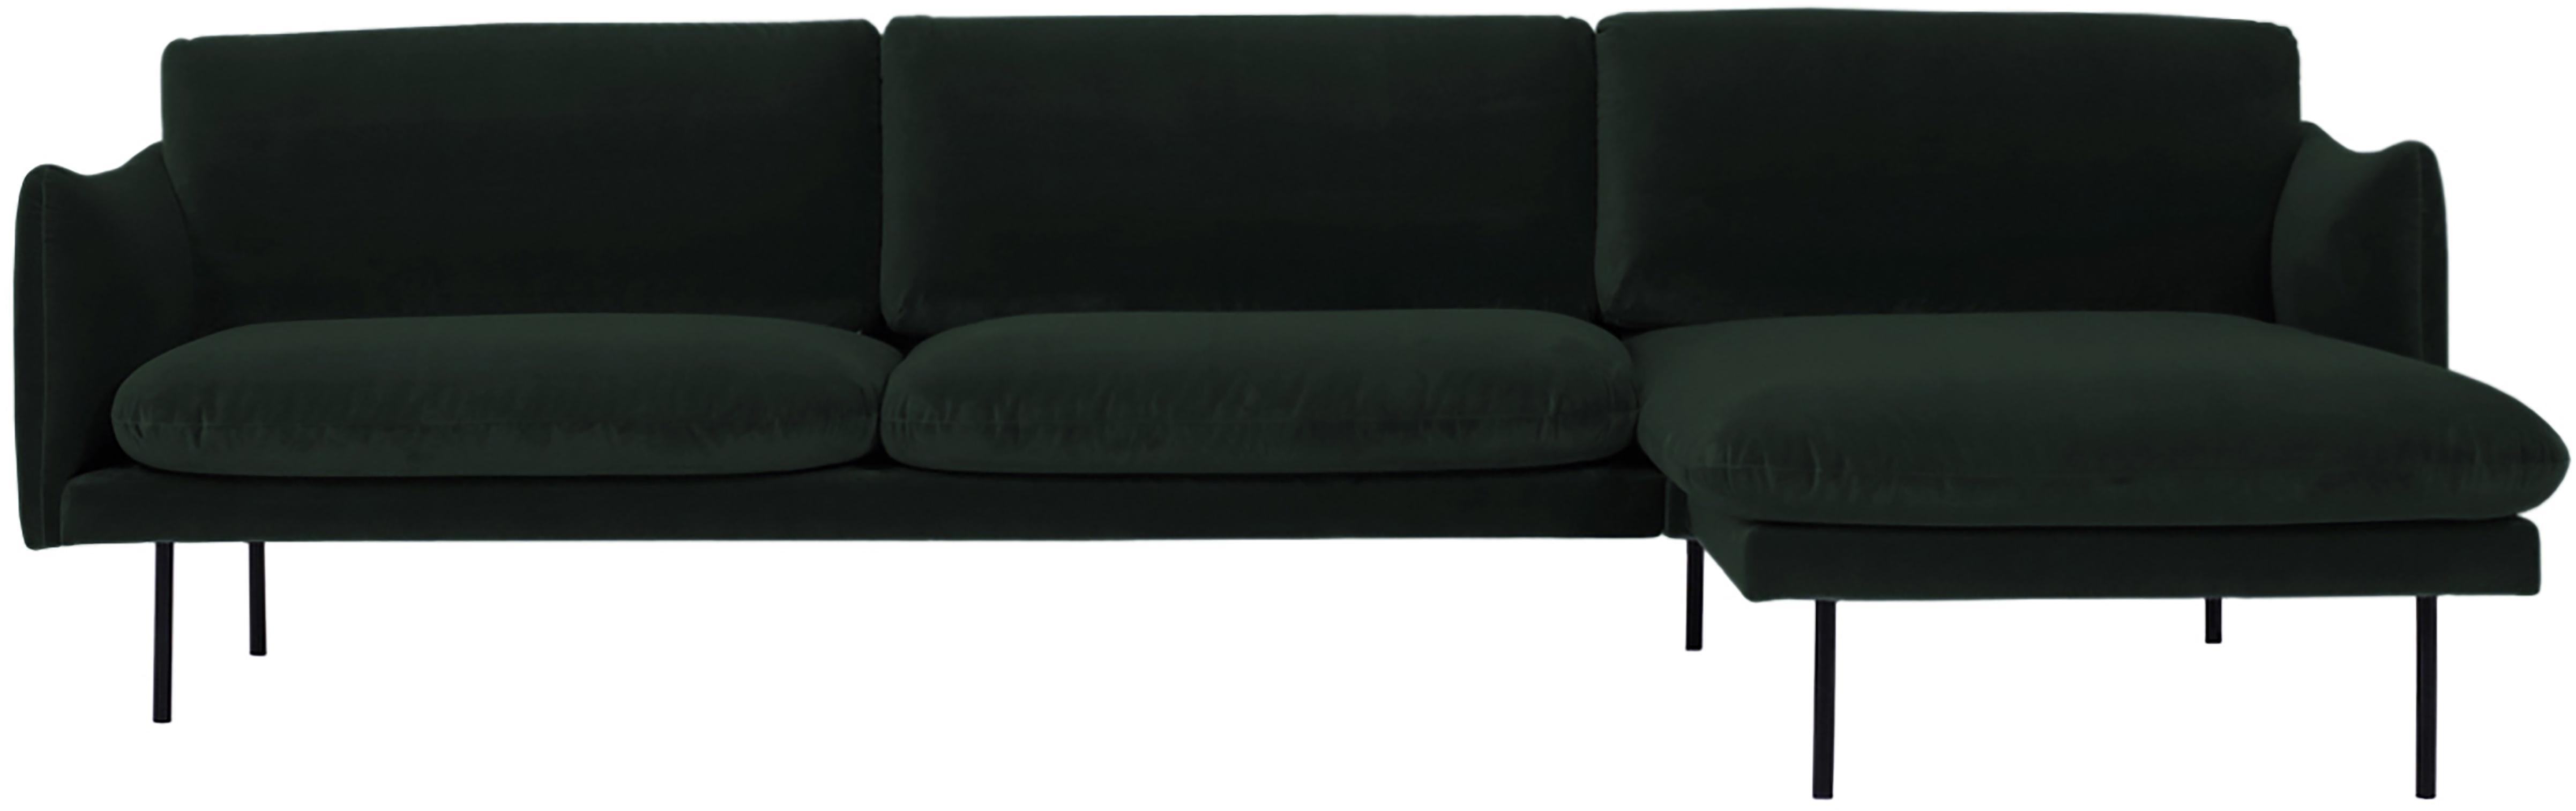 Fluwelen hoekbank Moby, Bekleding: fluweel (hoogwaardige pol, Frame: massief grenenhout, Poten: gepoedercoat metaal, Donkergroen, B 280 x D 160 cm